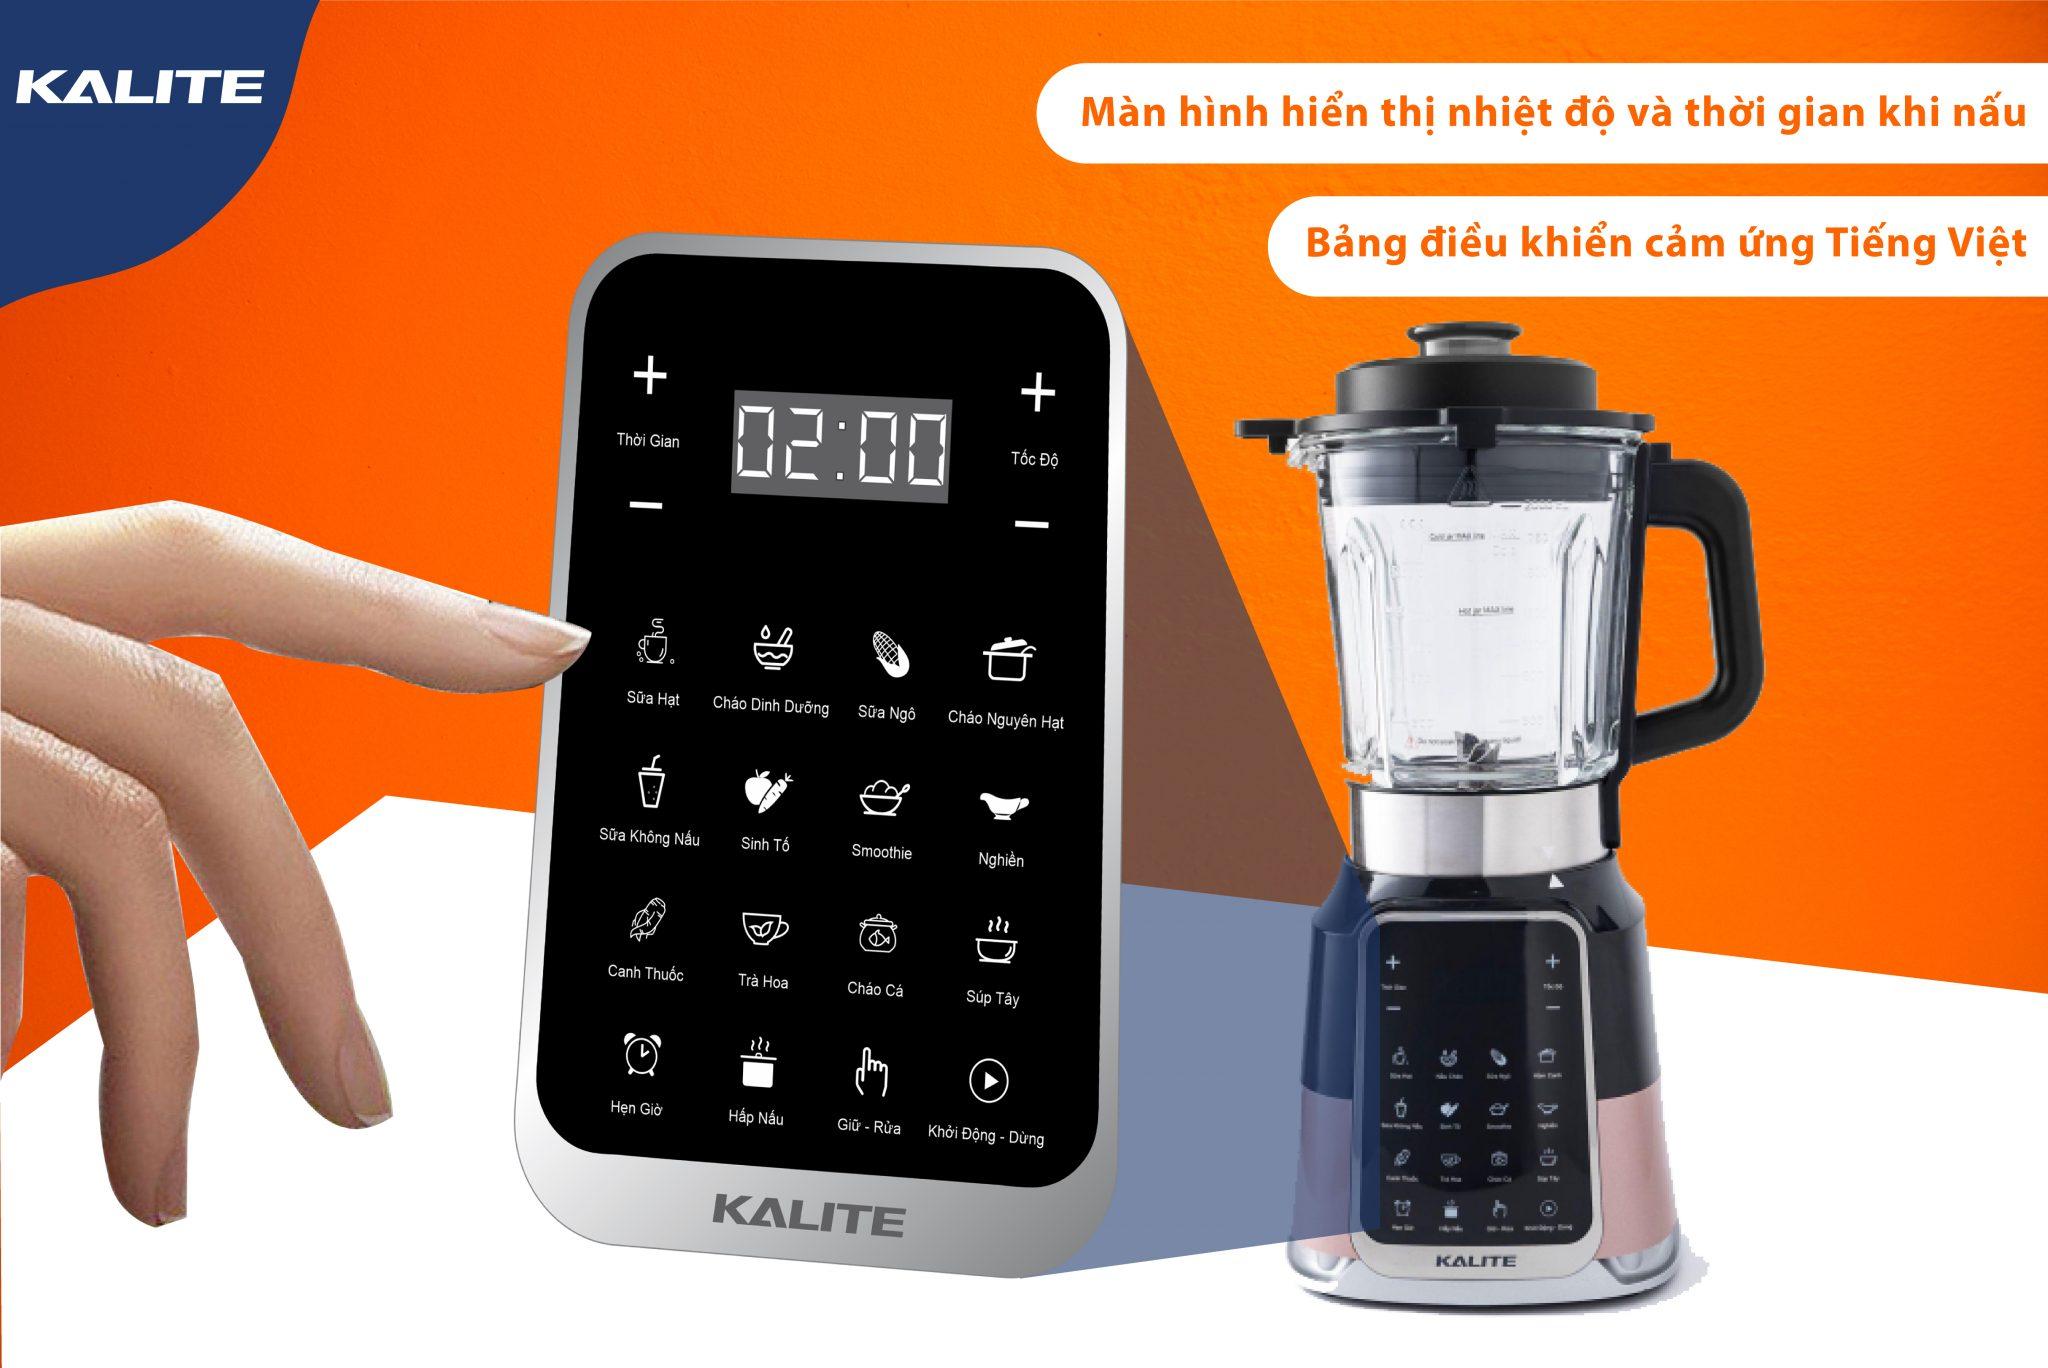 man-hinh-hien-thi-nhiet-do-may-nau-sua-hat-kalite-e200.-2048x1368